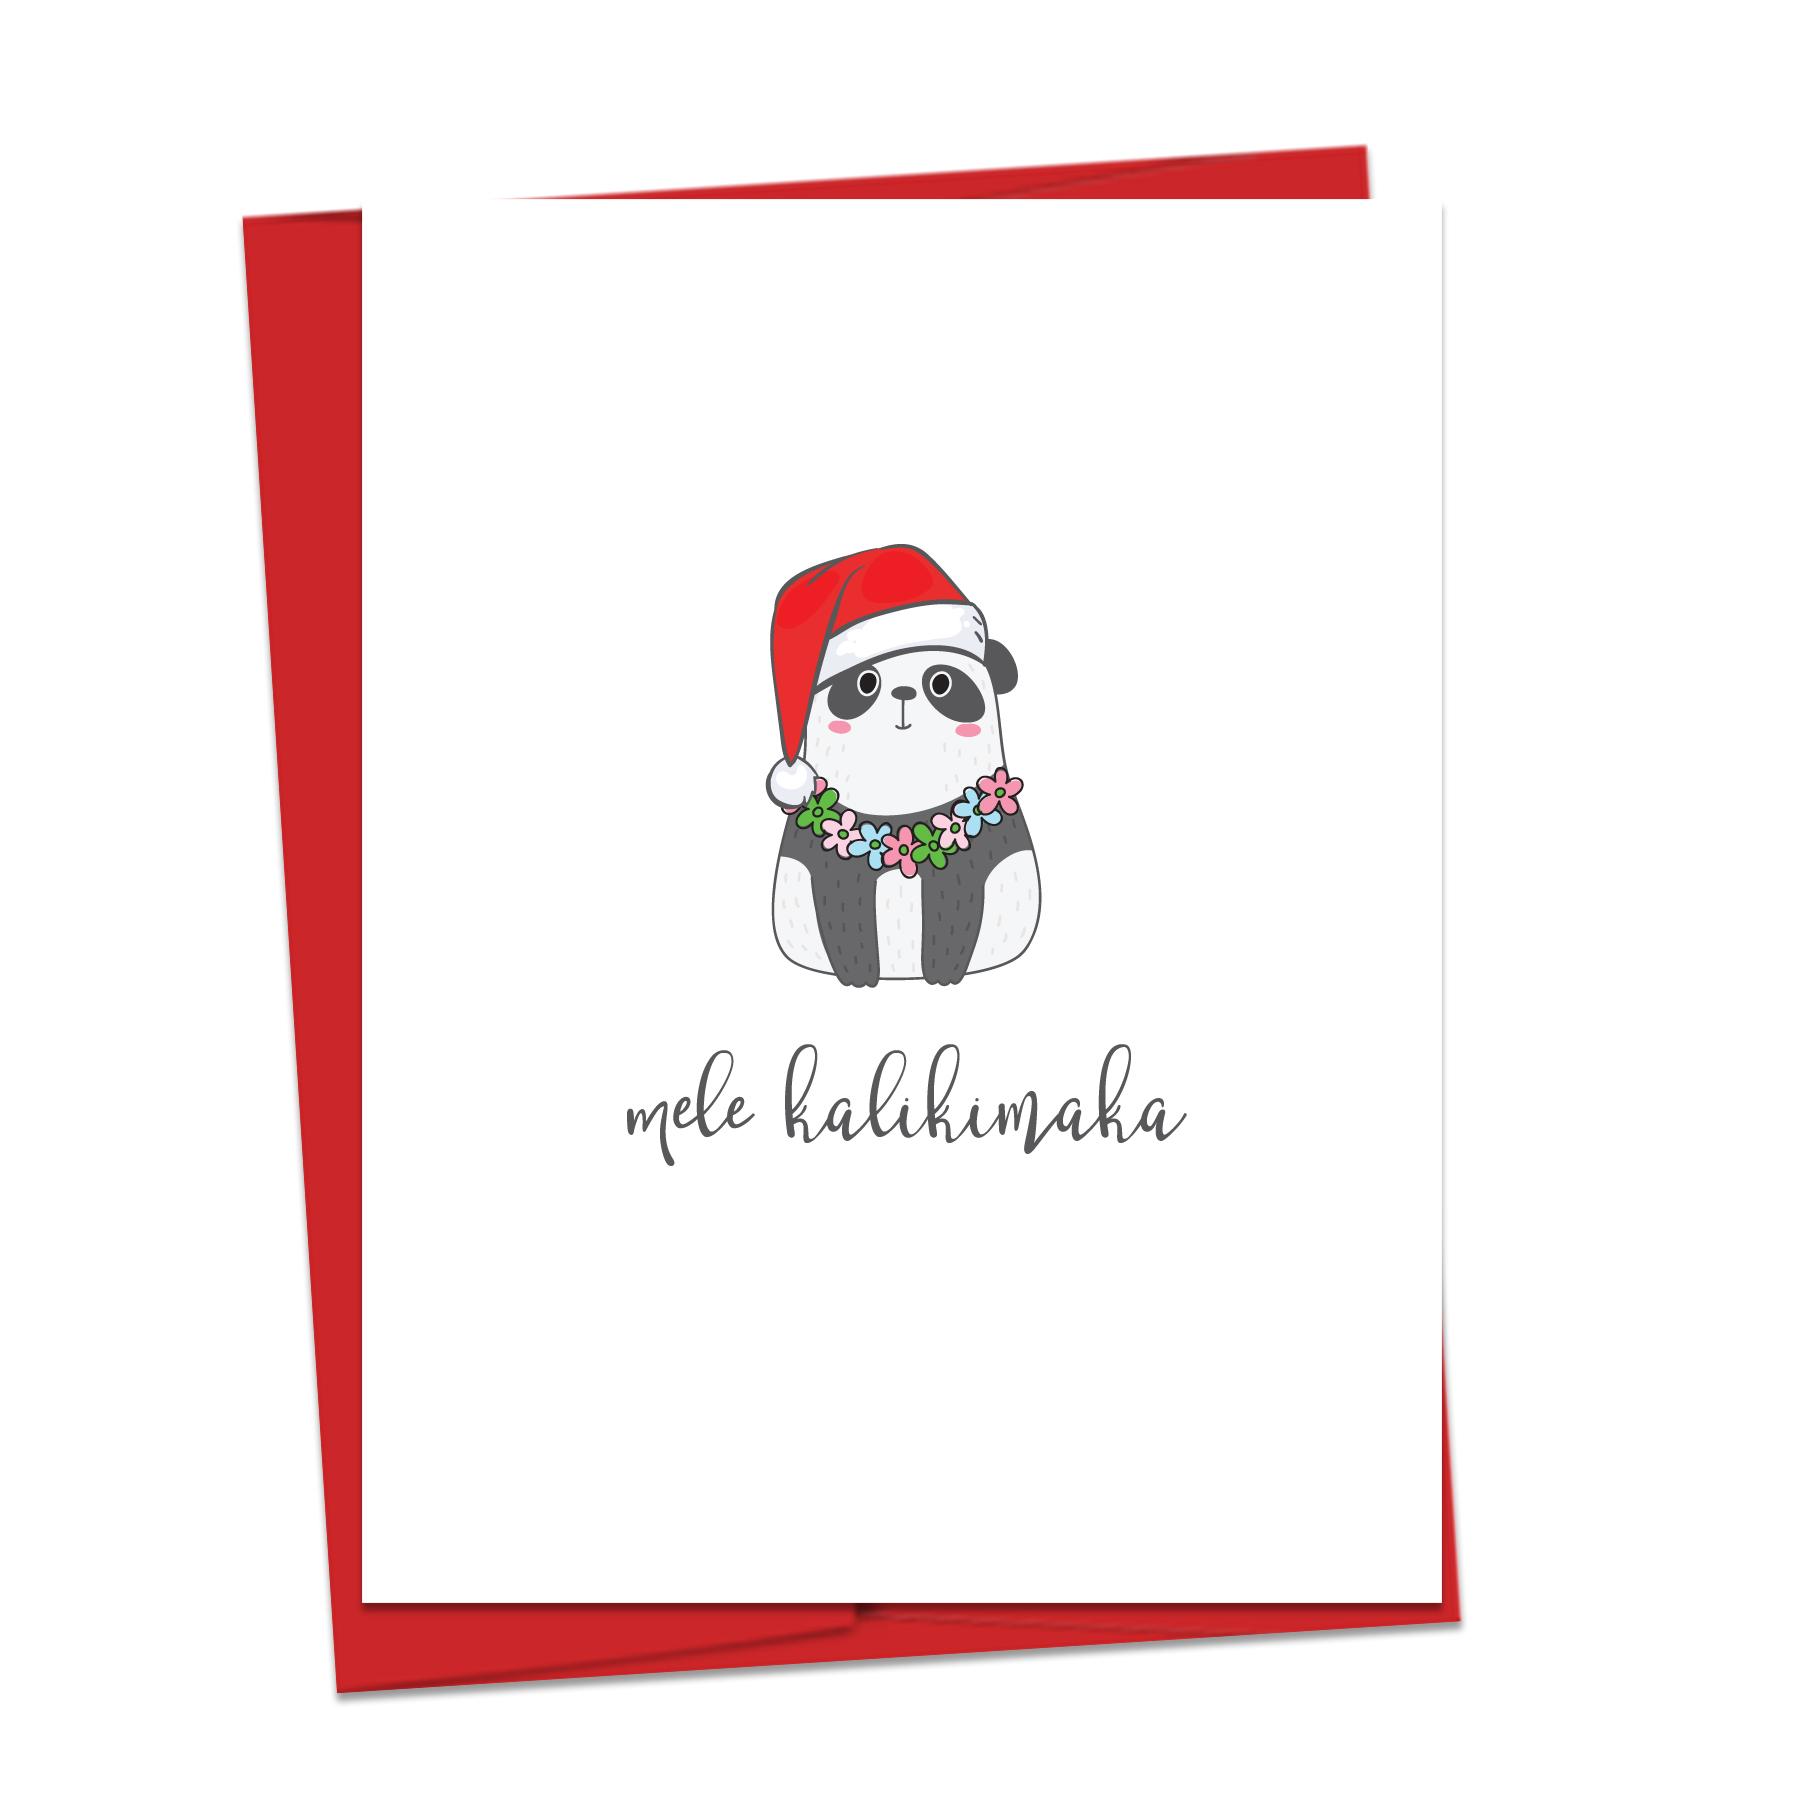 Mele Kalikimaka Christmas Cards.Mele Kalikimaka Panda Note Card